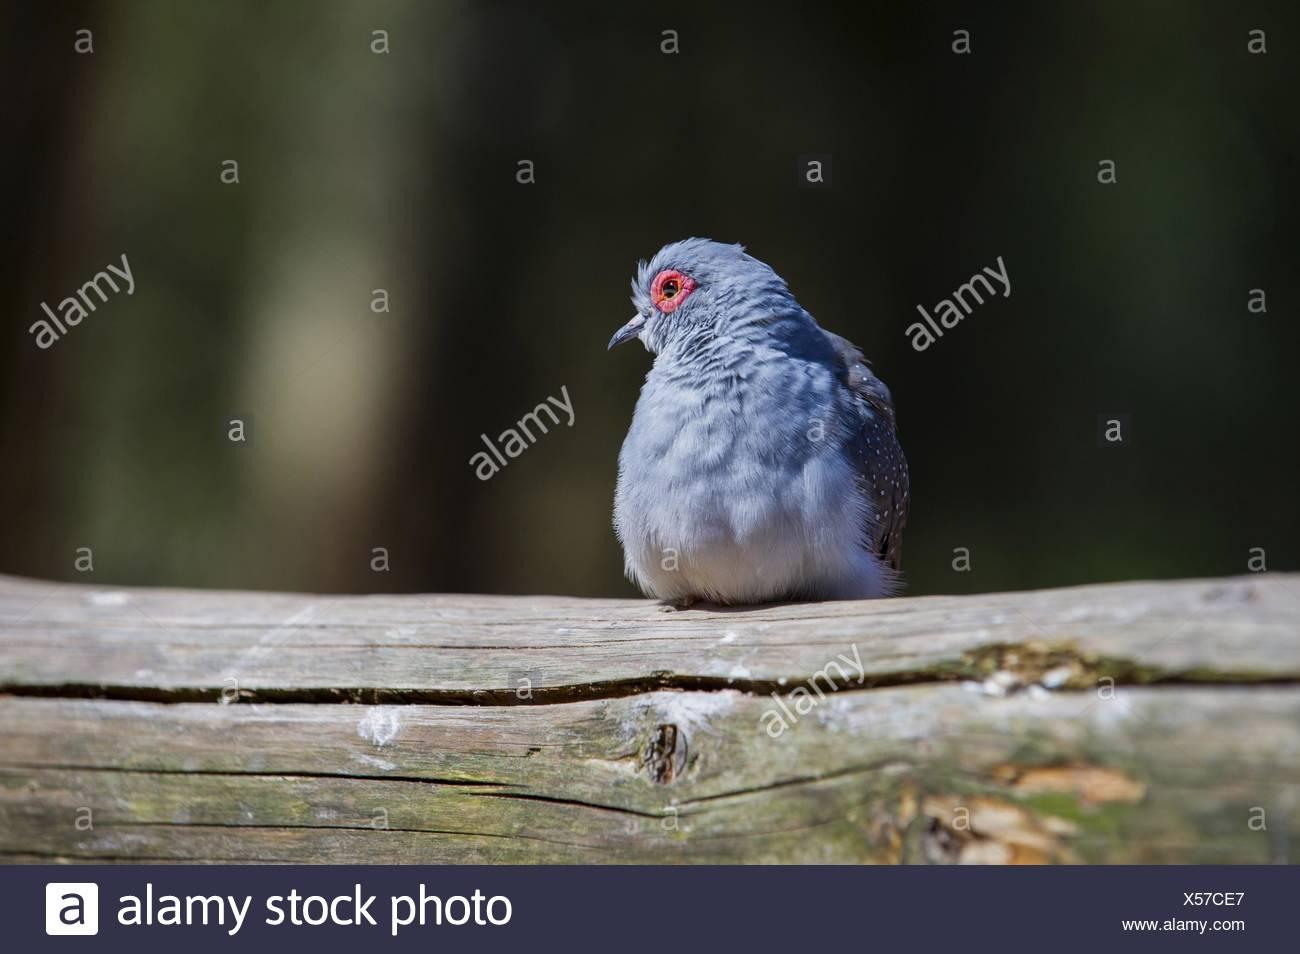 Diamond dove Bird Park Marlow Photo Stock